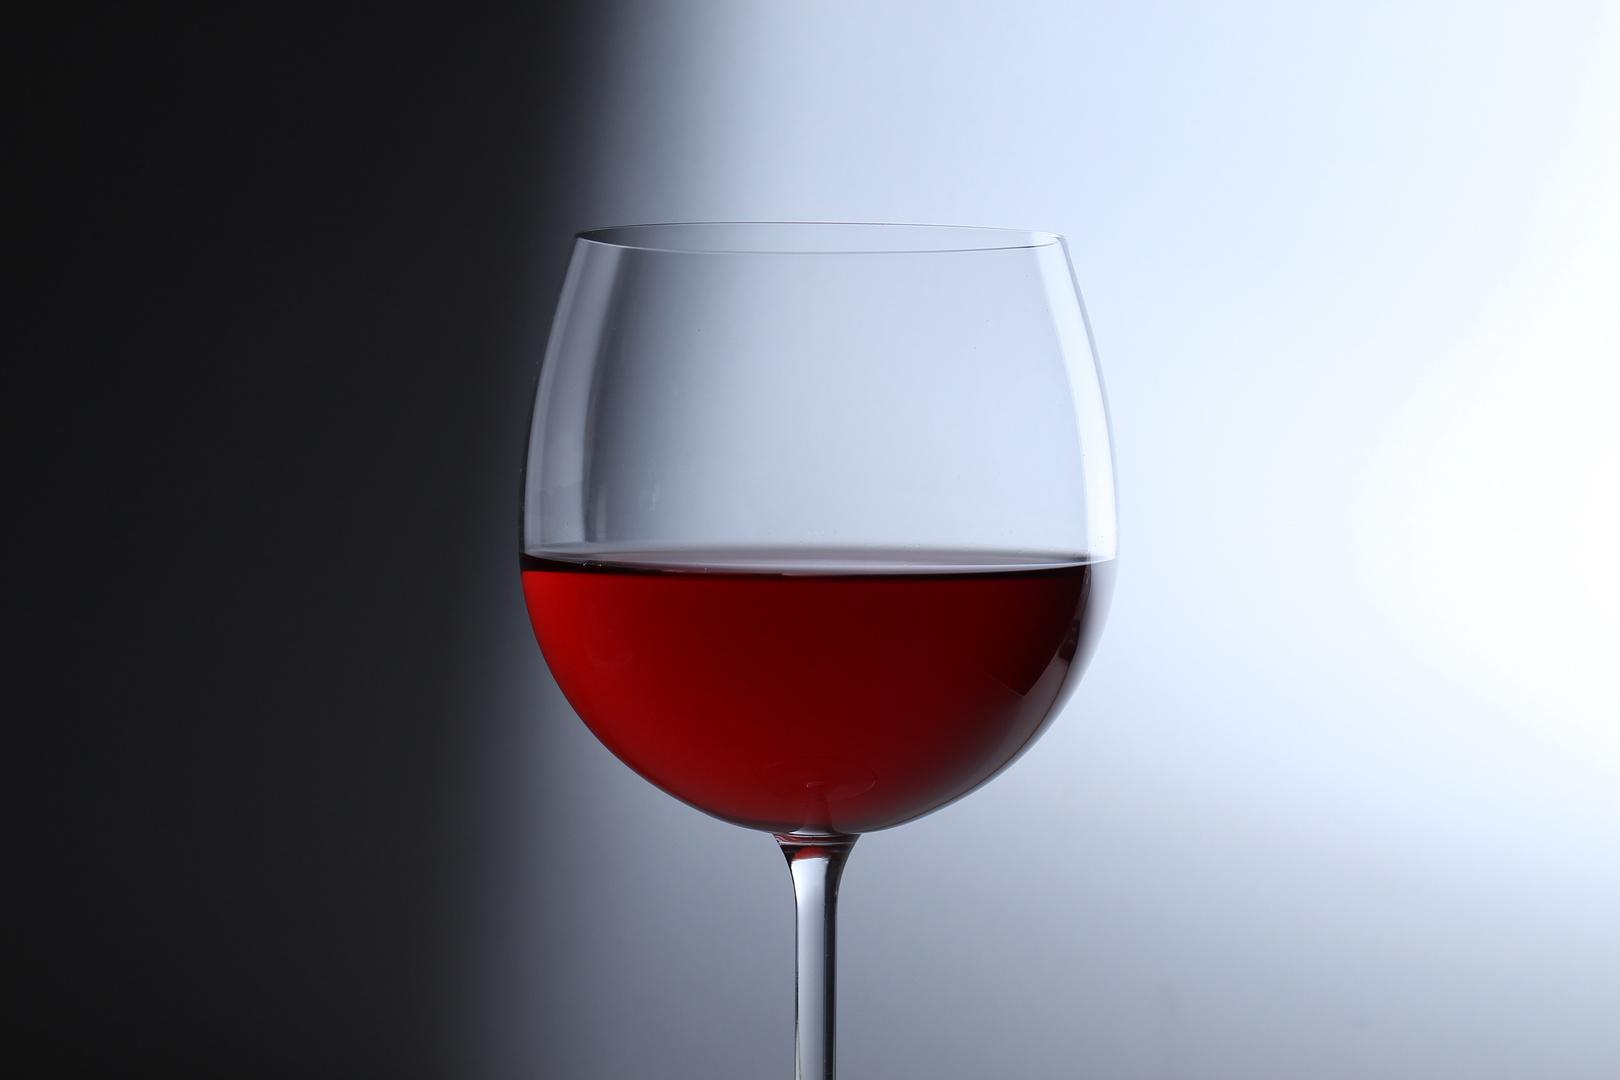 Weinglas ohne Alkohol